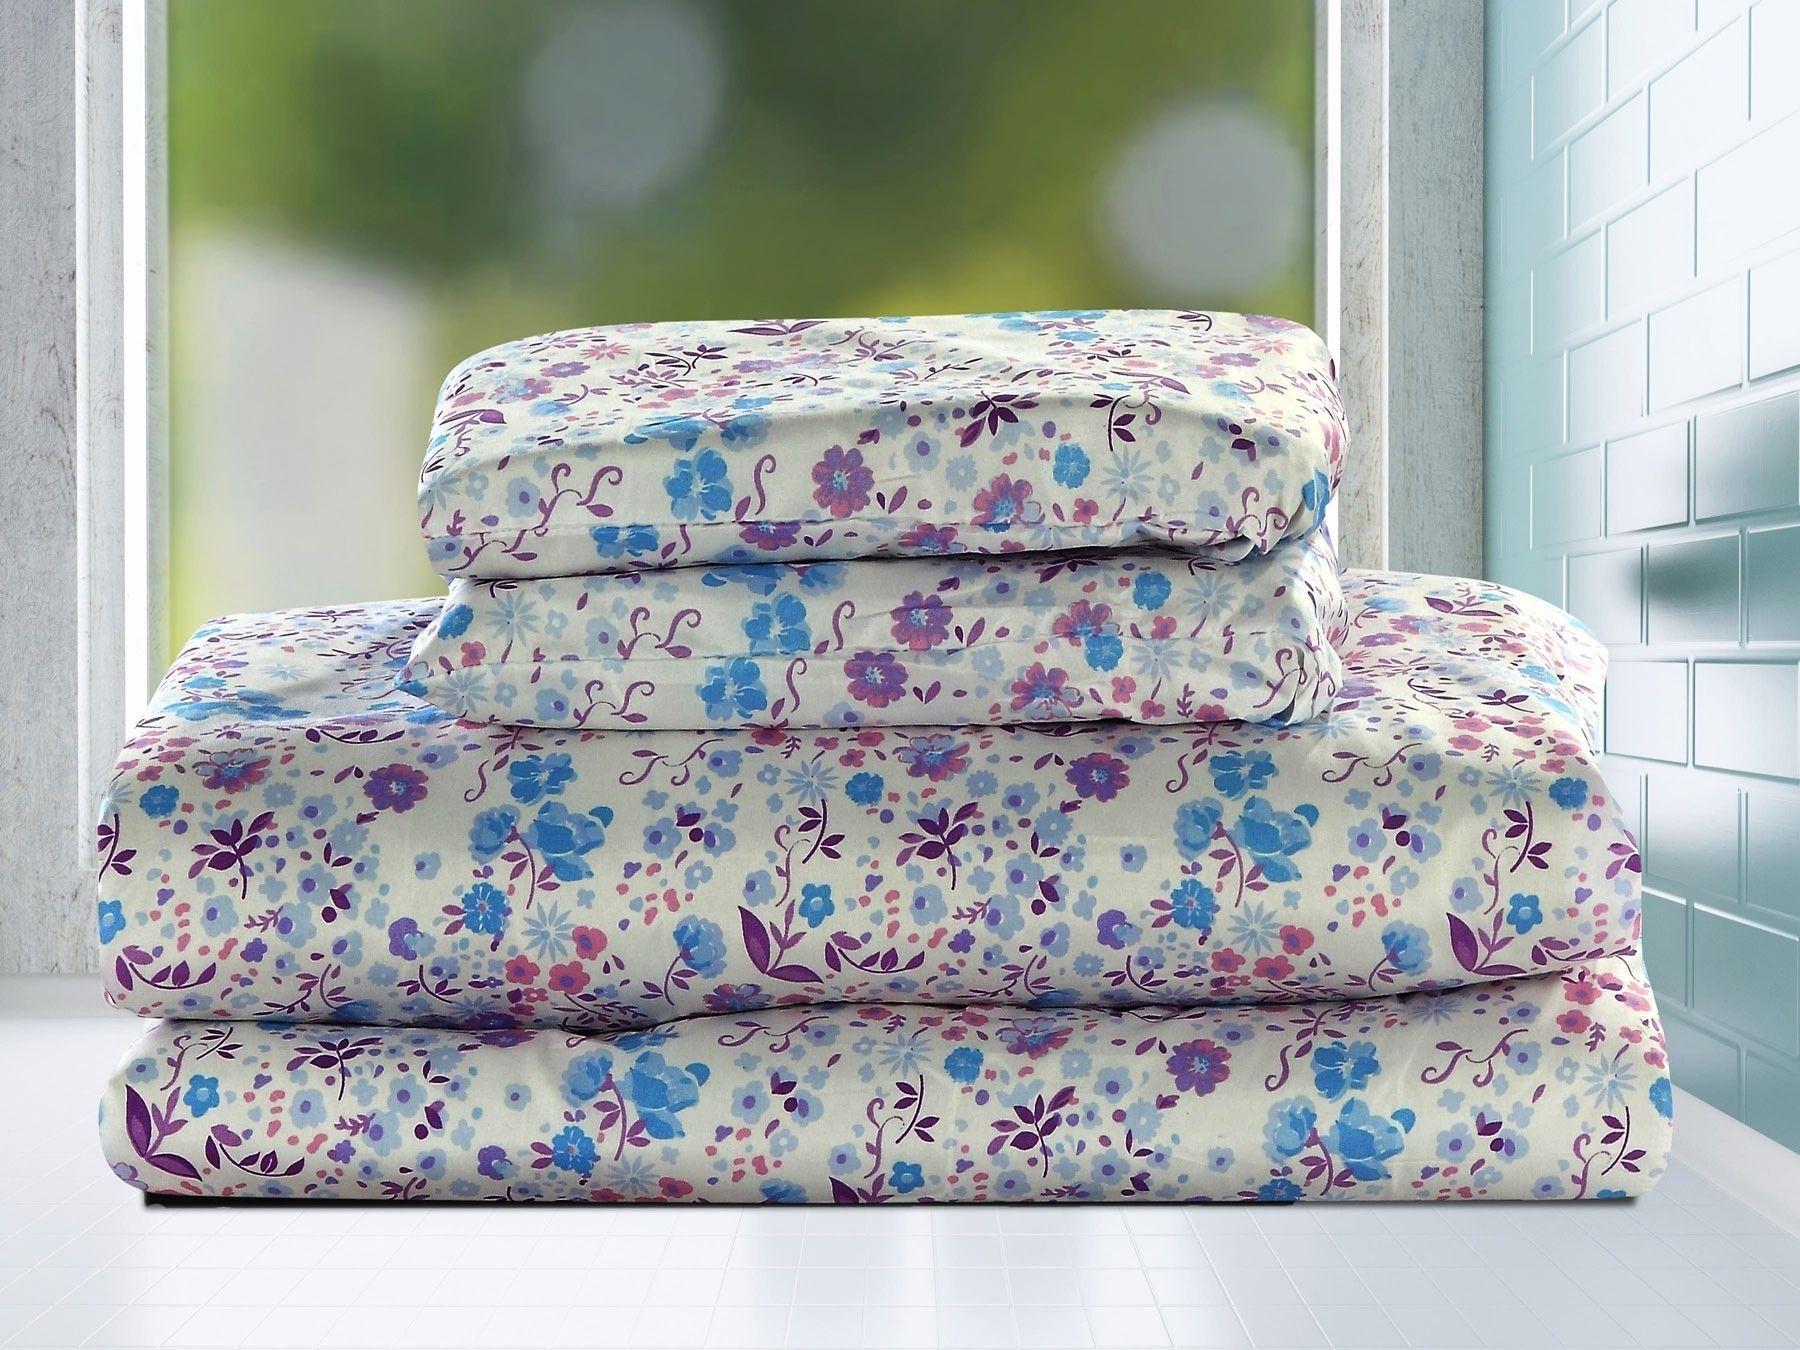 Beatrice aria floral full 4 piece microfiber sheet set